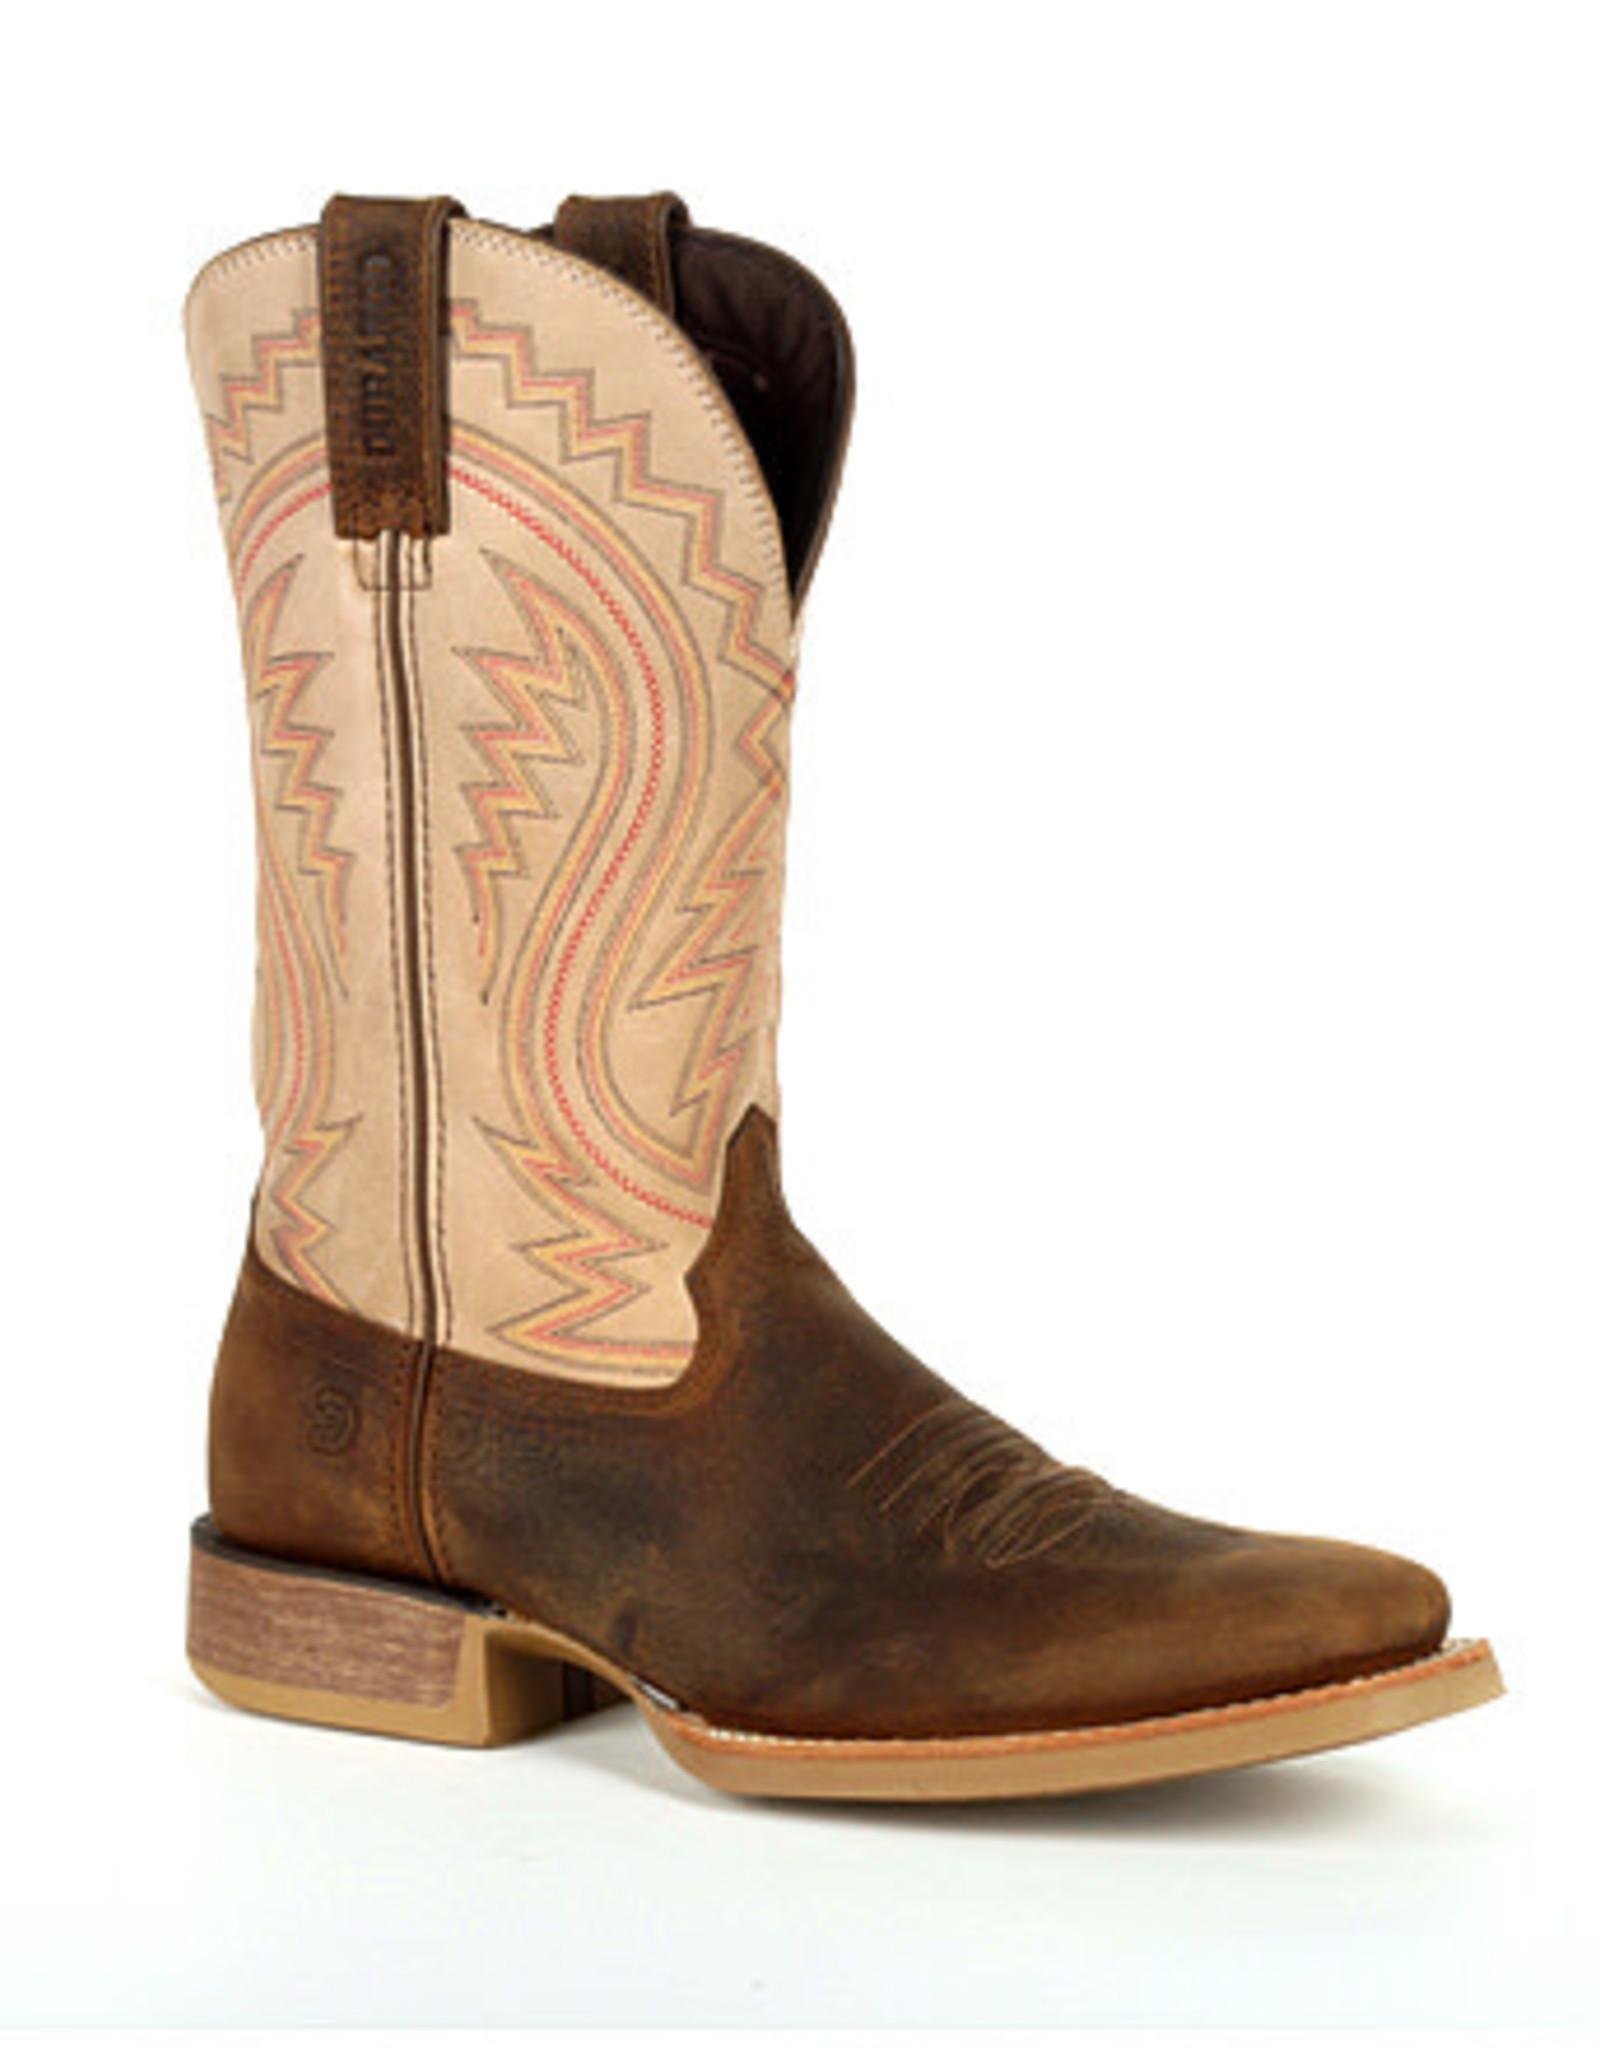 Durango Mens Durango Rebel Pro Distressed Brown Square Toe Boot